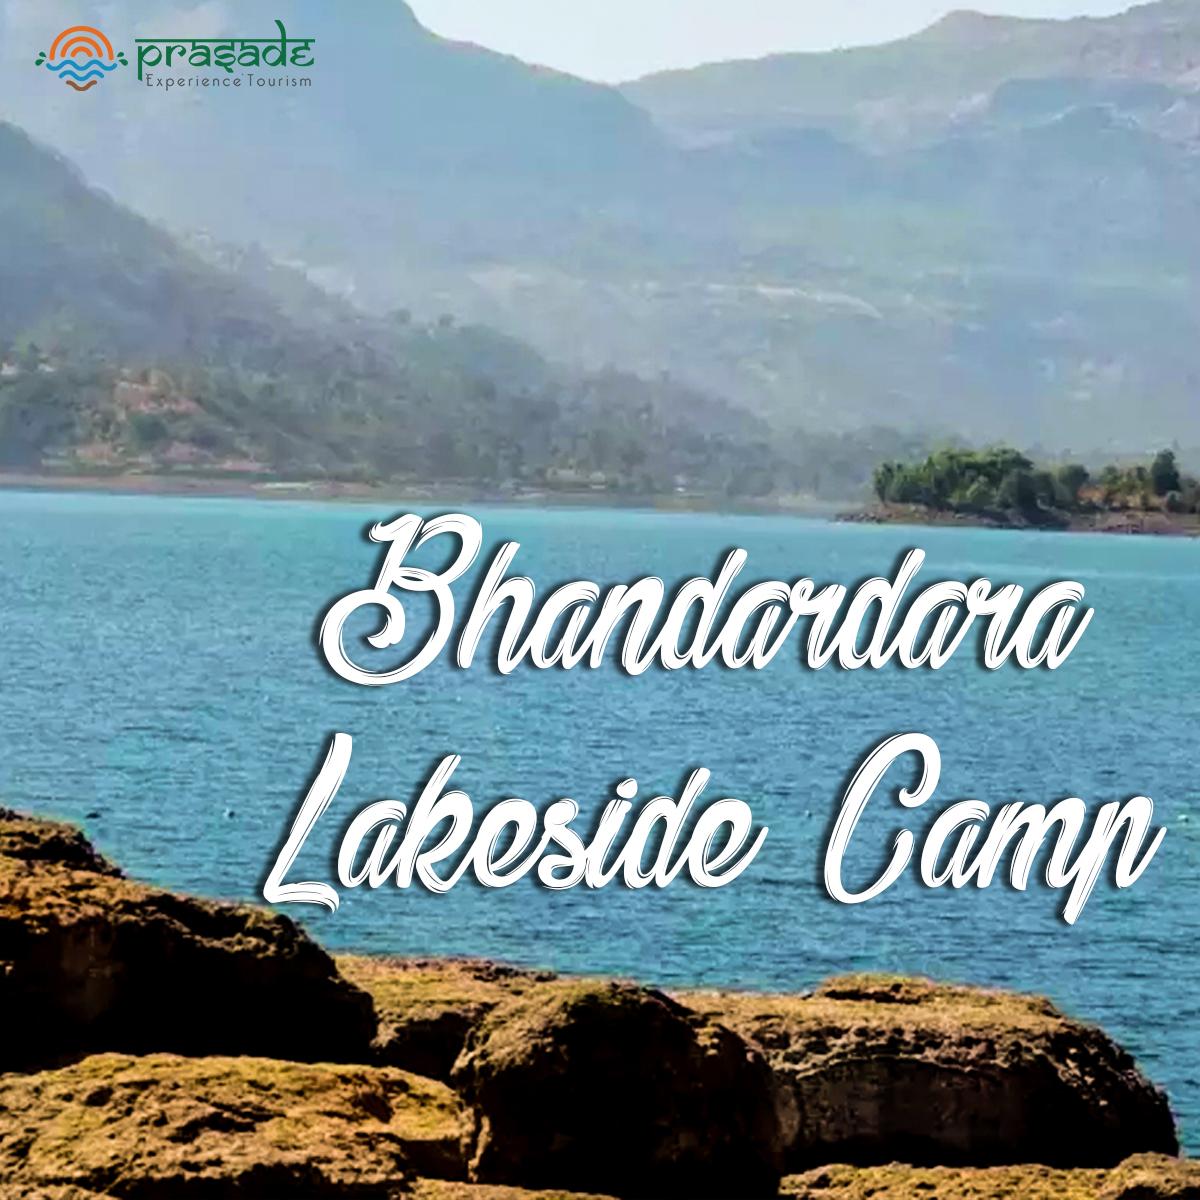 #exploresolo #exploreworld #tents #wanderlusts #indiatourism #indiatravel #indiatravelgram #loveindia #bucketlists #travelblogging #travelbloggersindia #wanderers #travelindiapic.twitter.com/w5g1IwWJG4